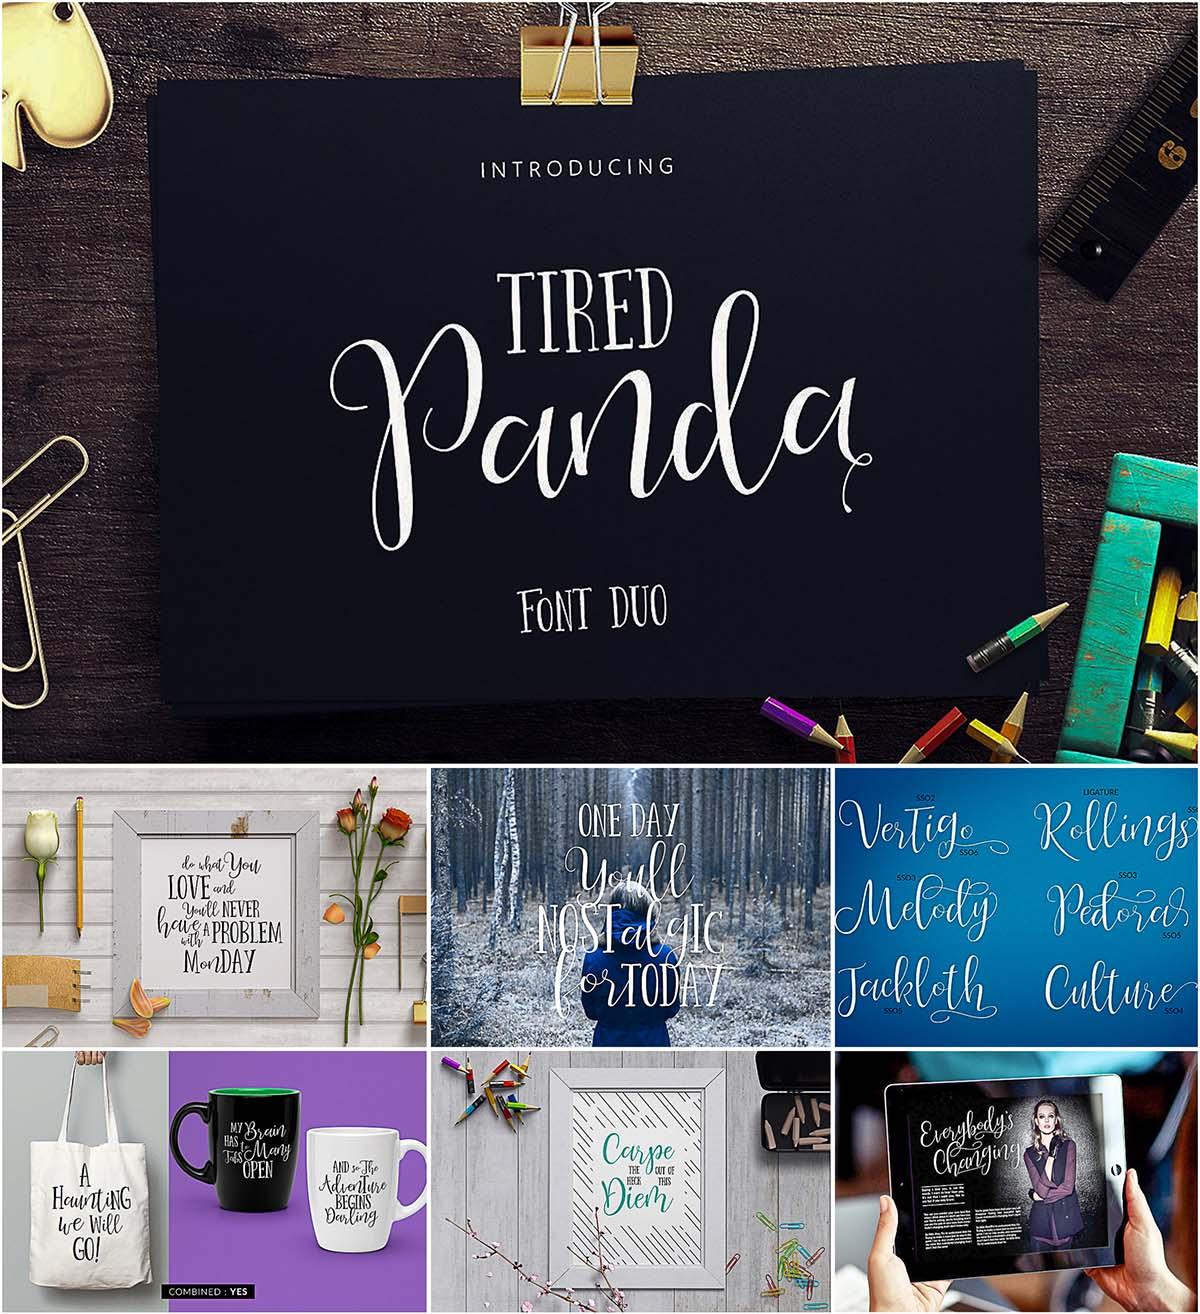 Tired panda font